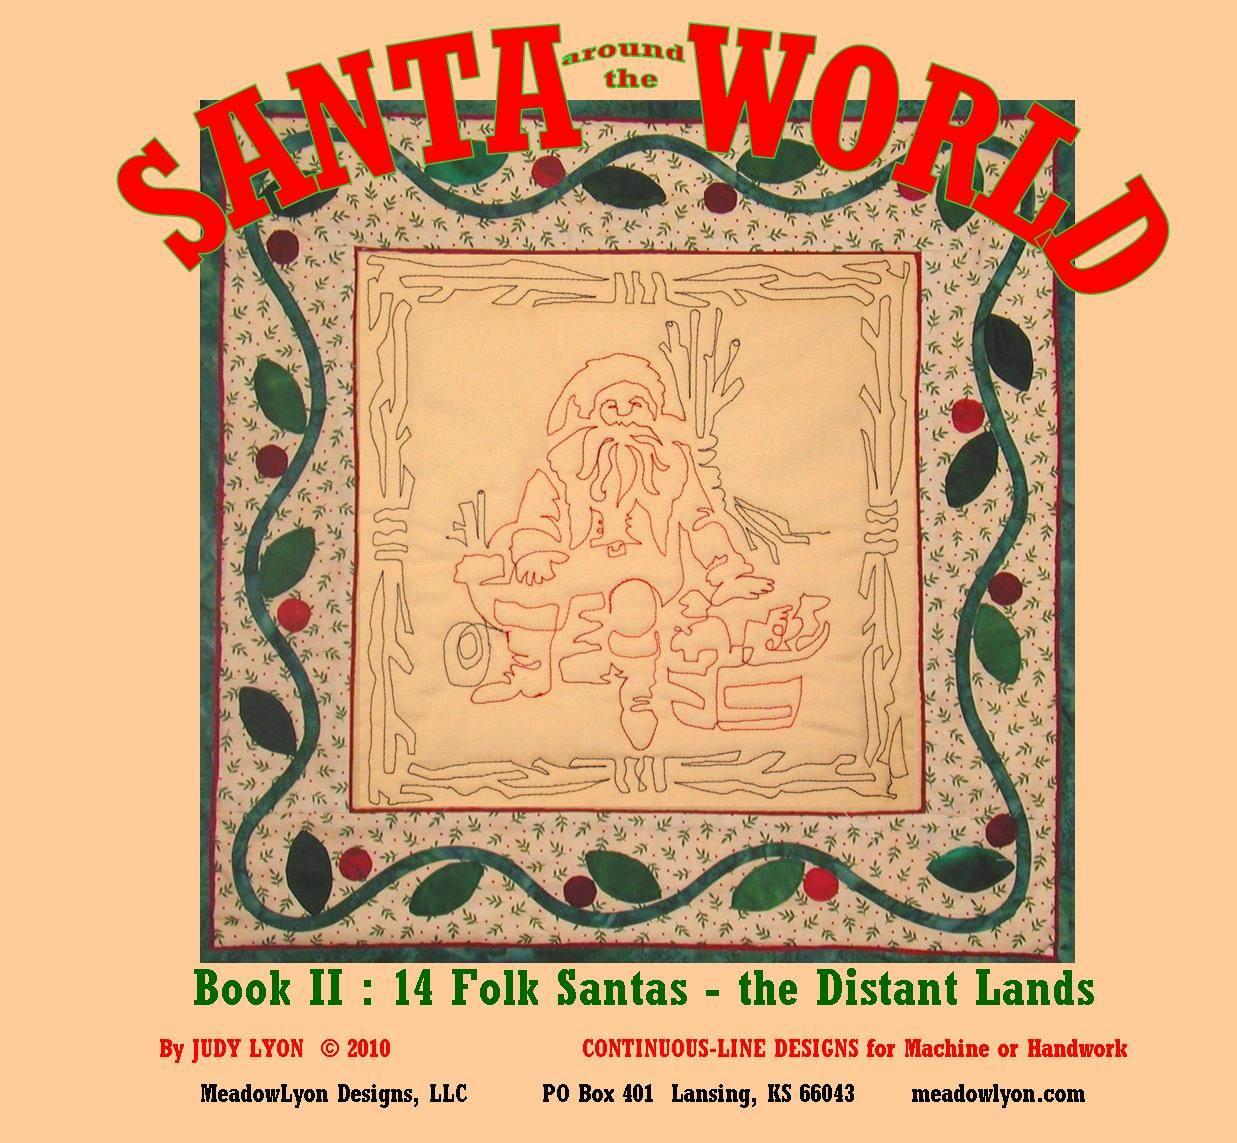 santa world cover bk 2